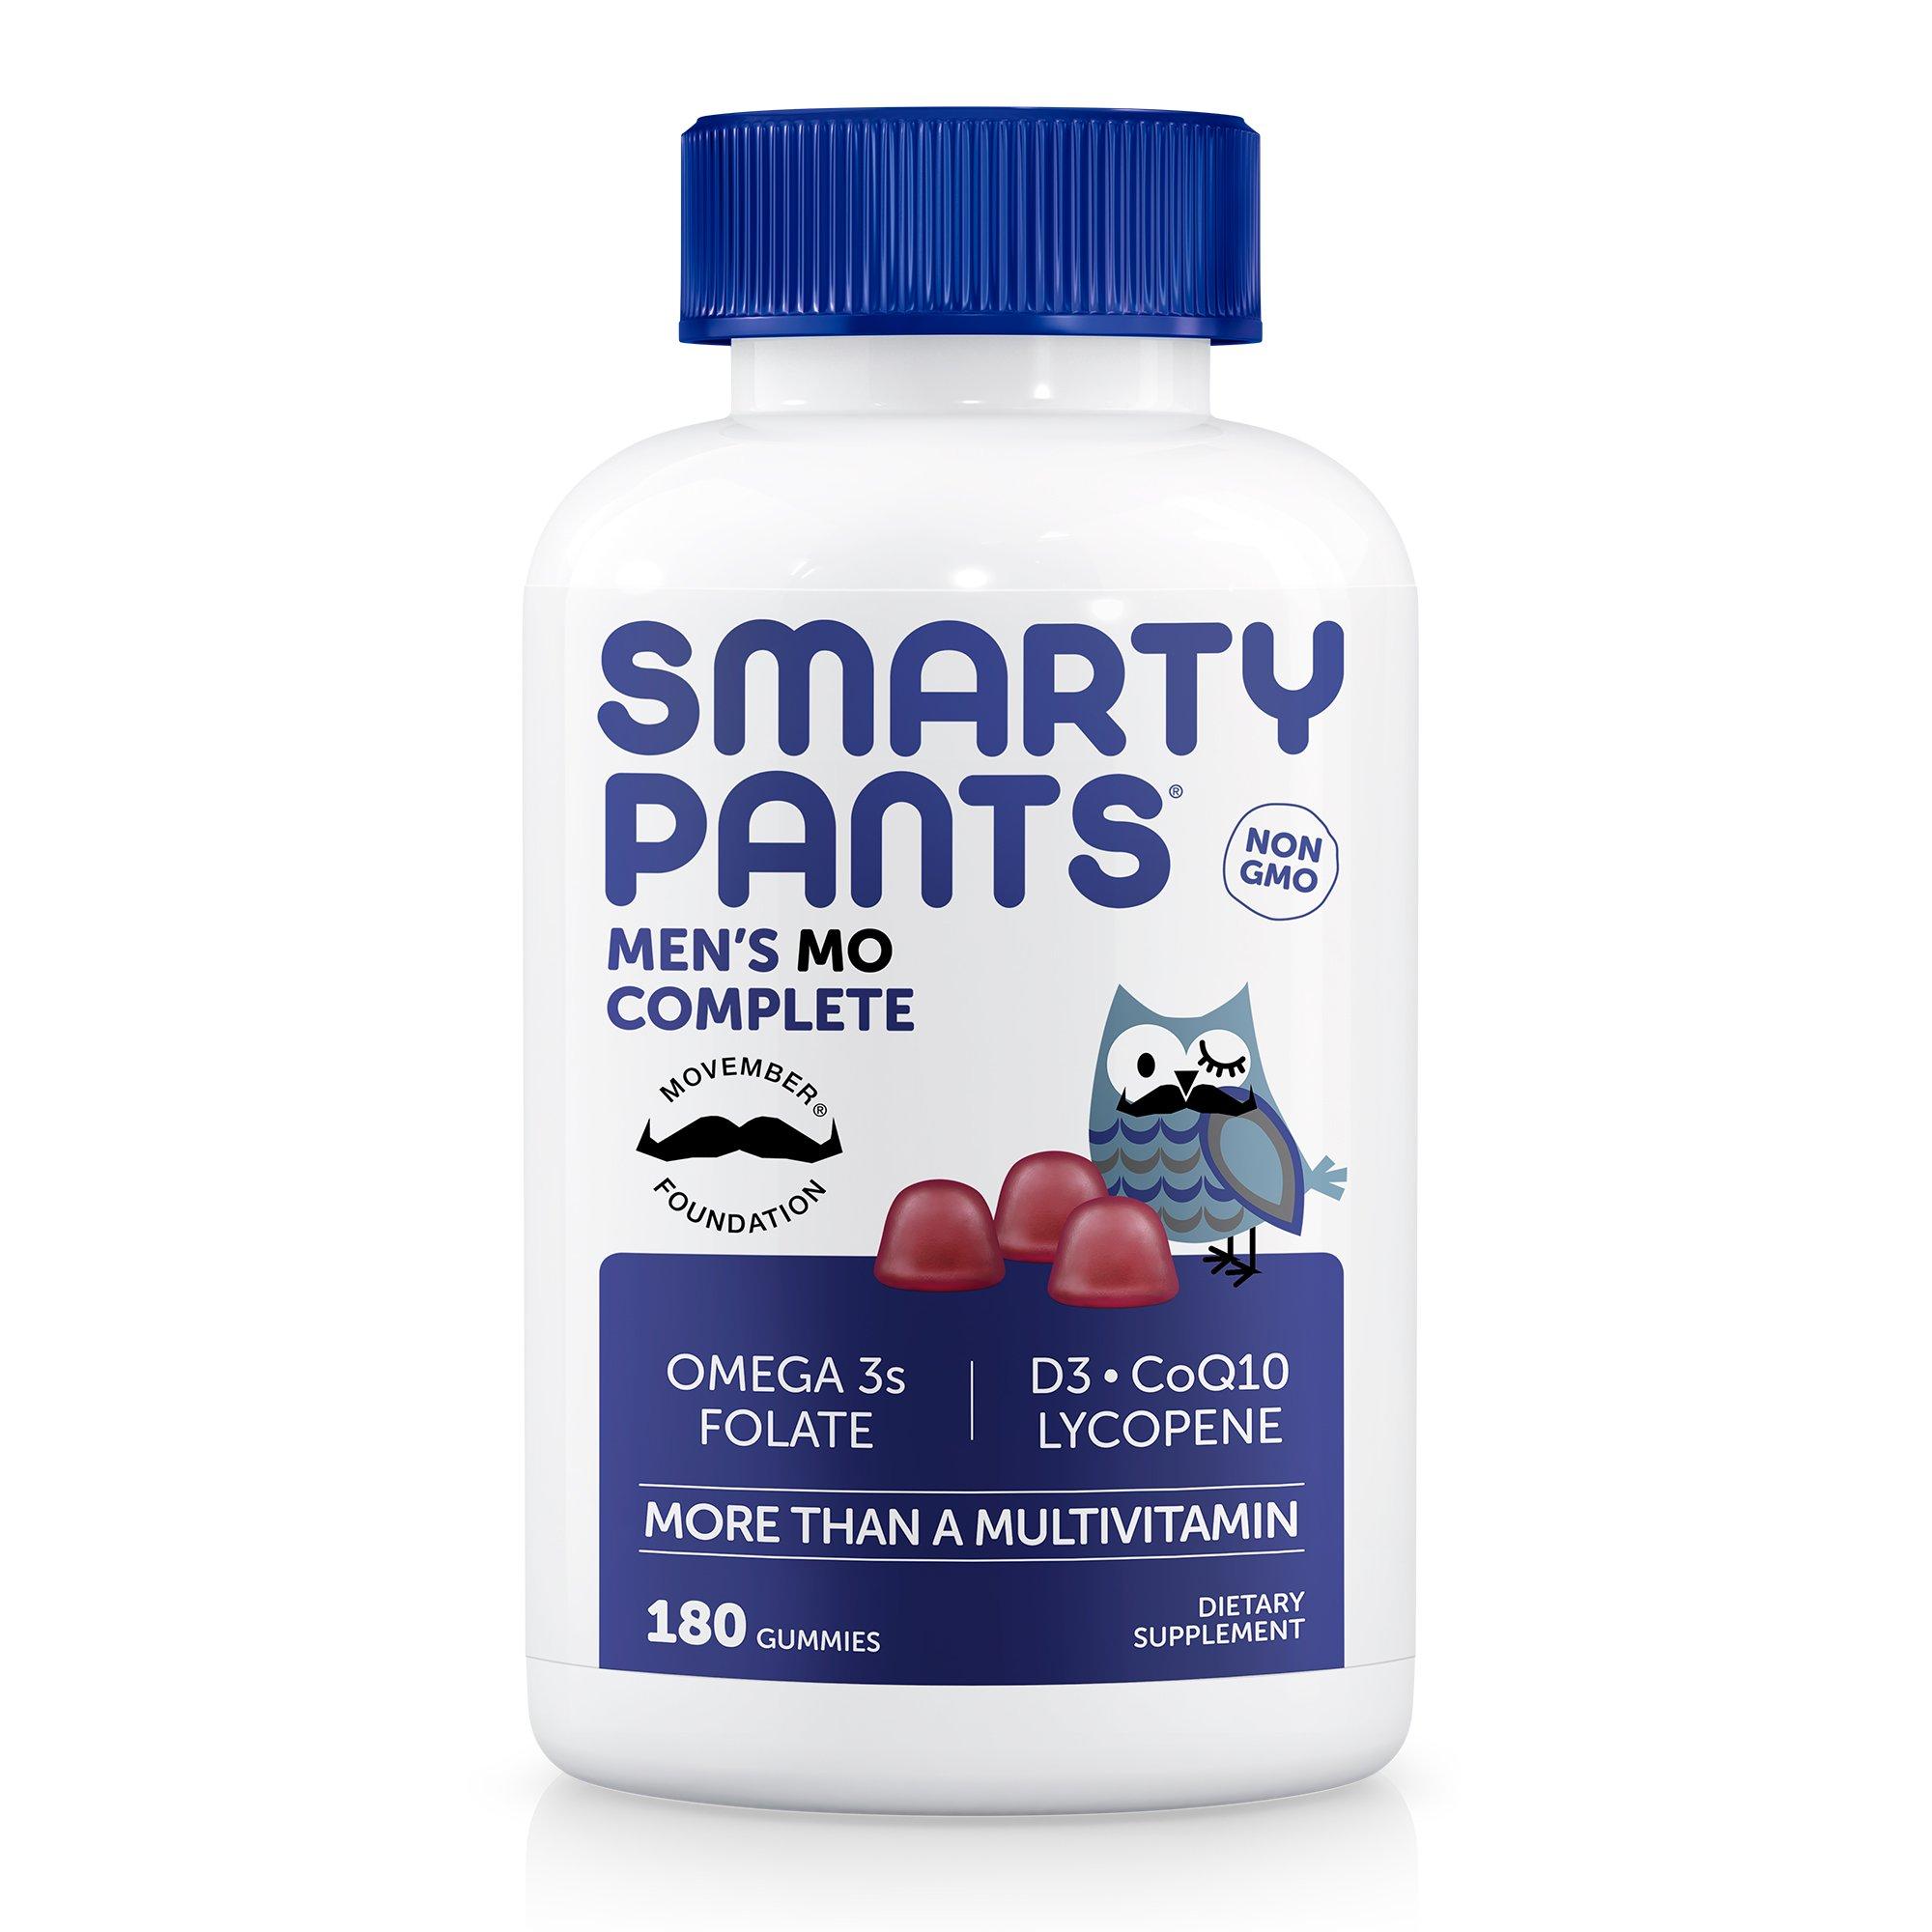 SmartyPants Men's Complete Gummy Vitamins: Multivitamin, CoQ10, Lycopene, Methyl B12, & Omega 3 EPA/DHA Fish Oil, 180 count (30 Day Supply)